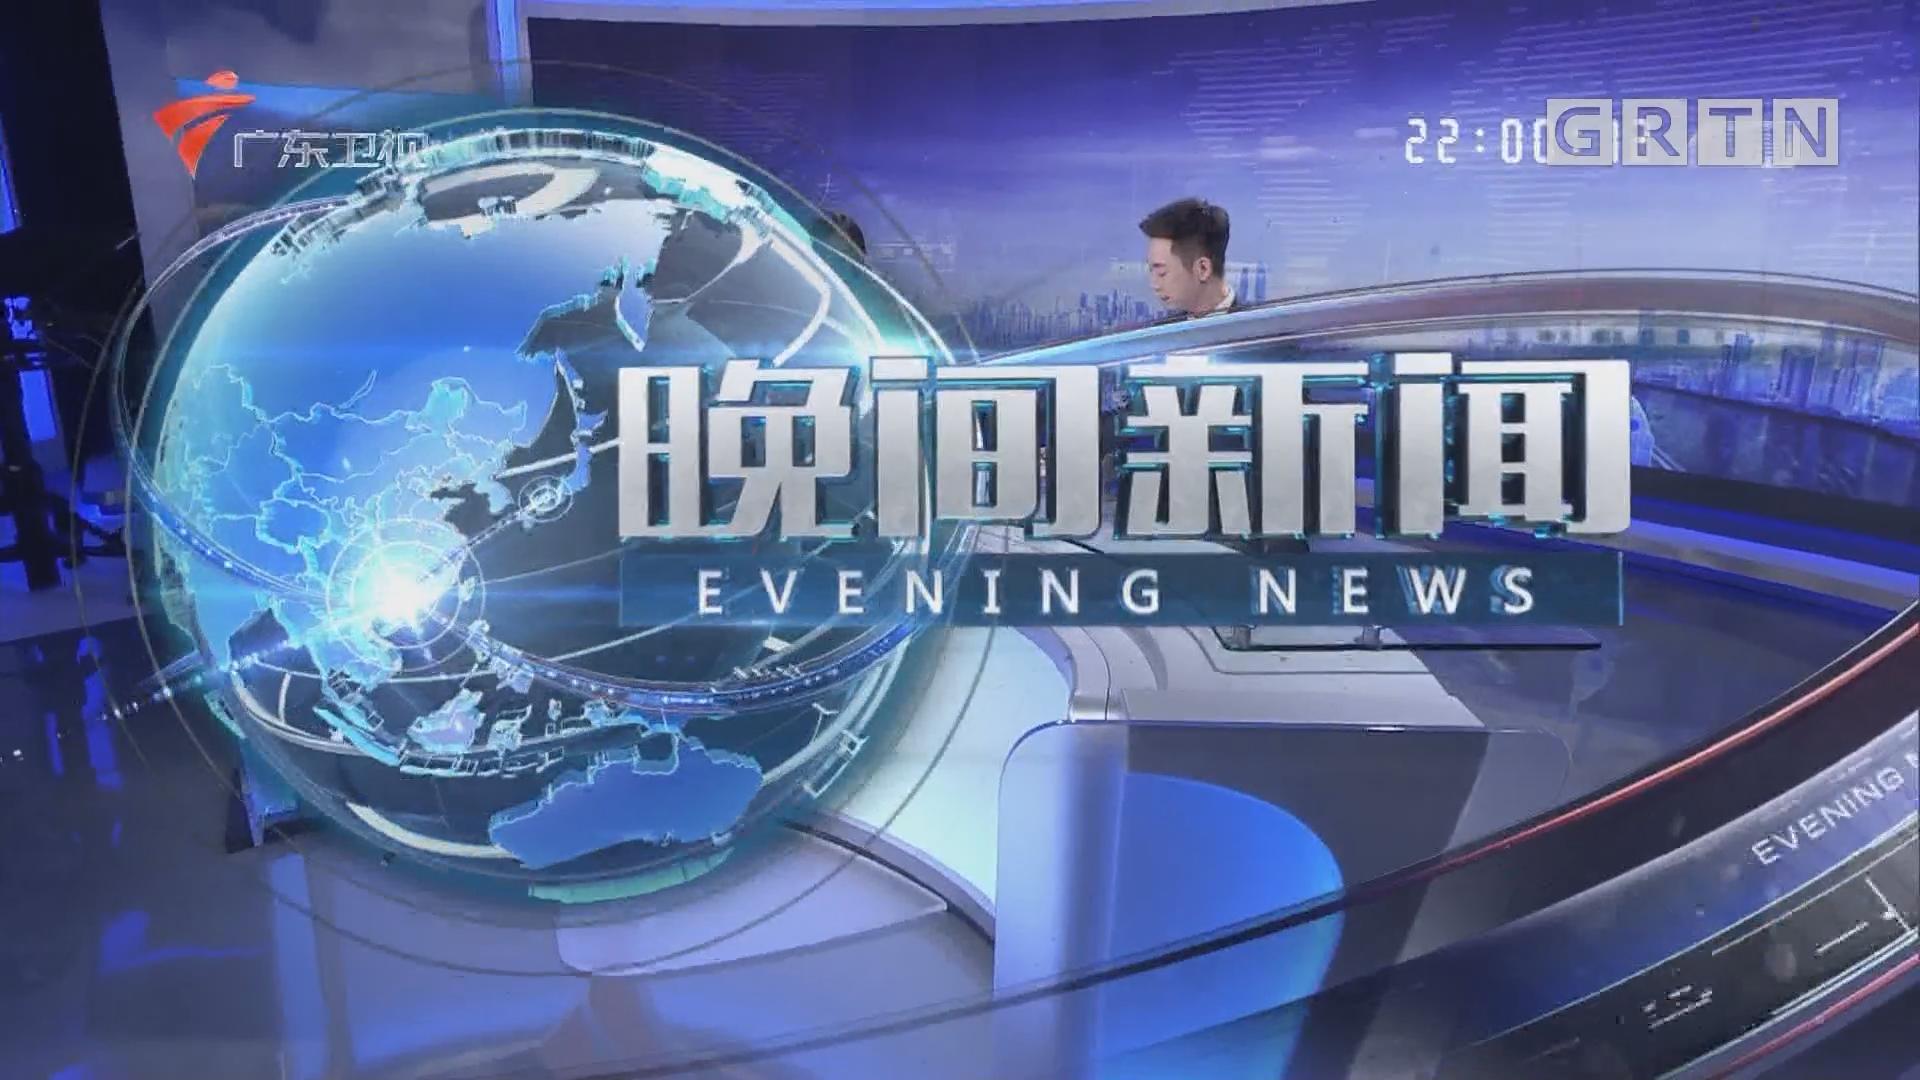 [HD][2019-08-20]晚间新闻:深圳各界反响热烈 沿着建设先行示范区奋力前行